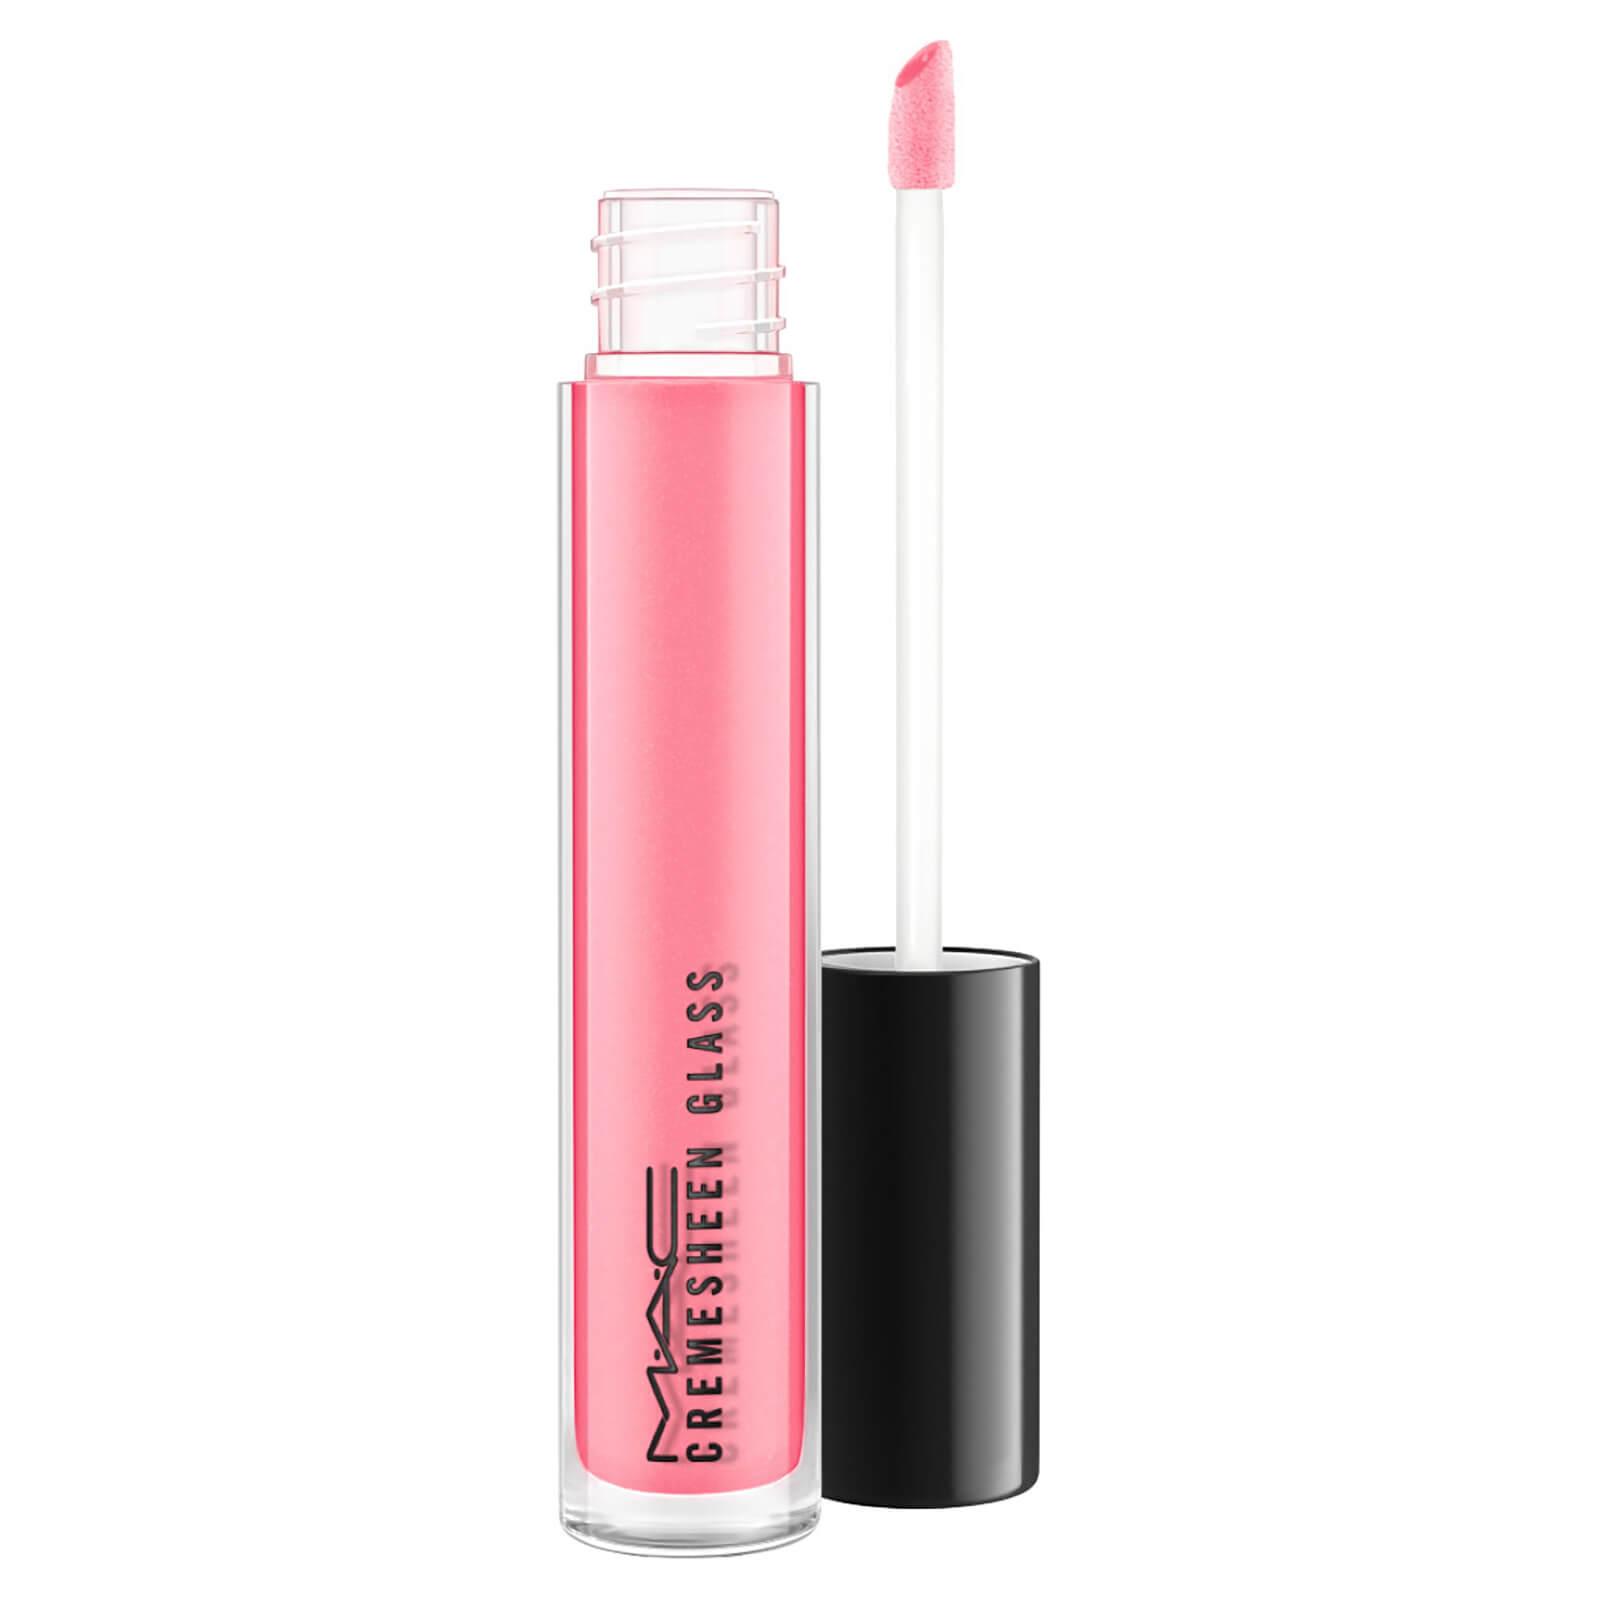 MAC Brillant à Lèvres Cremesheen Glass Lip Finish (teintes variées) - Deelight